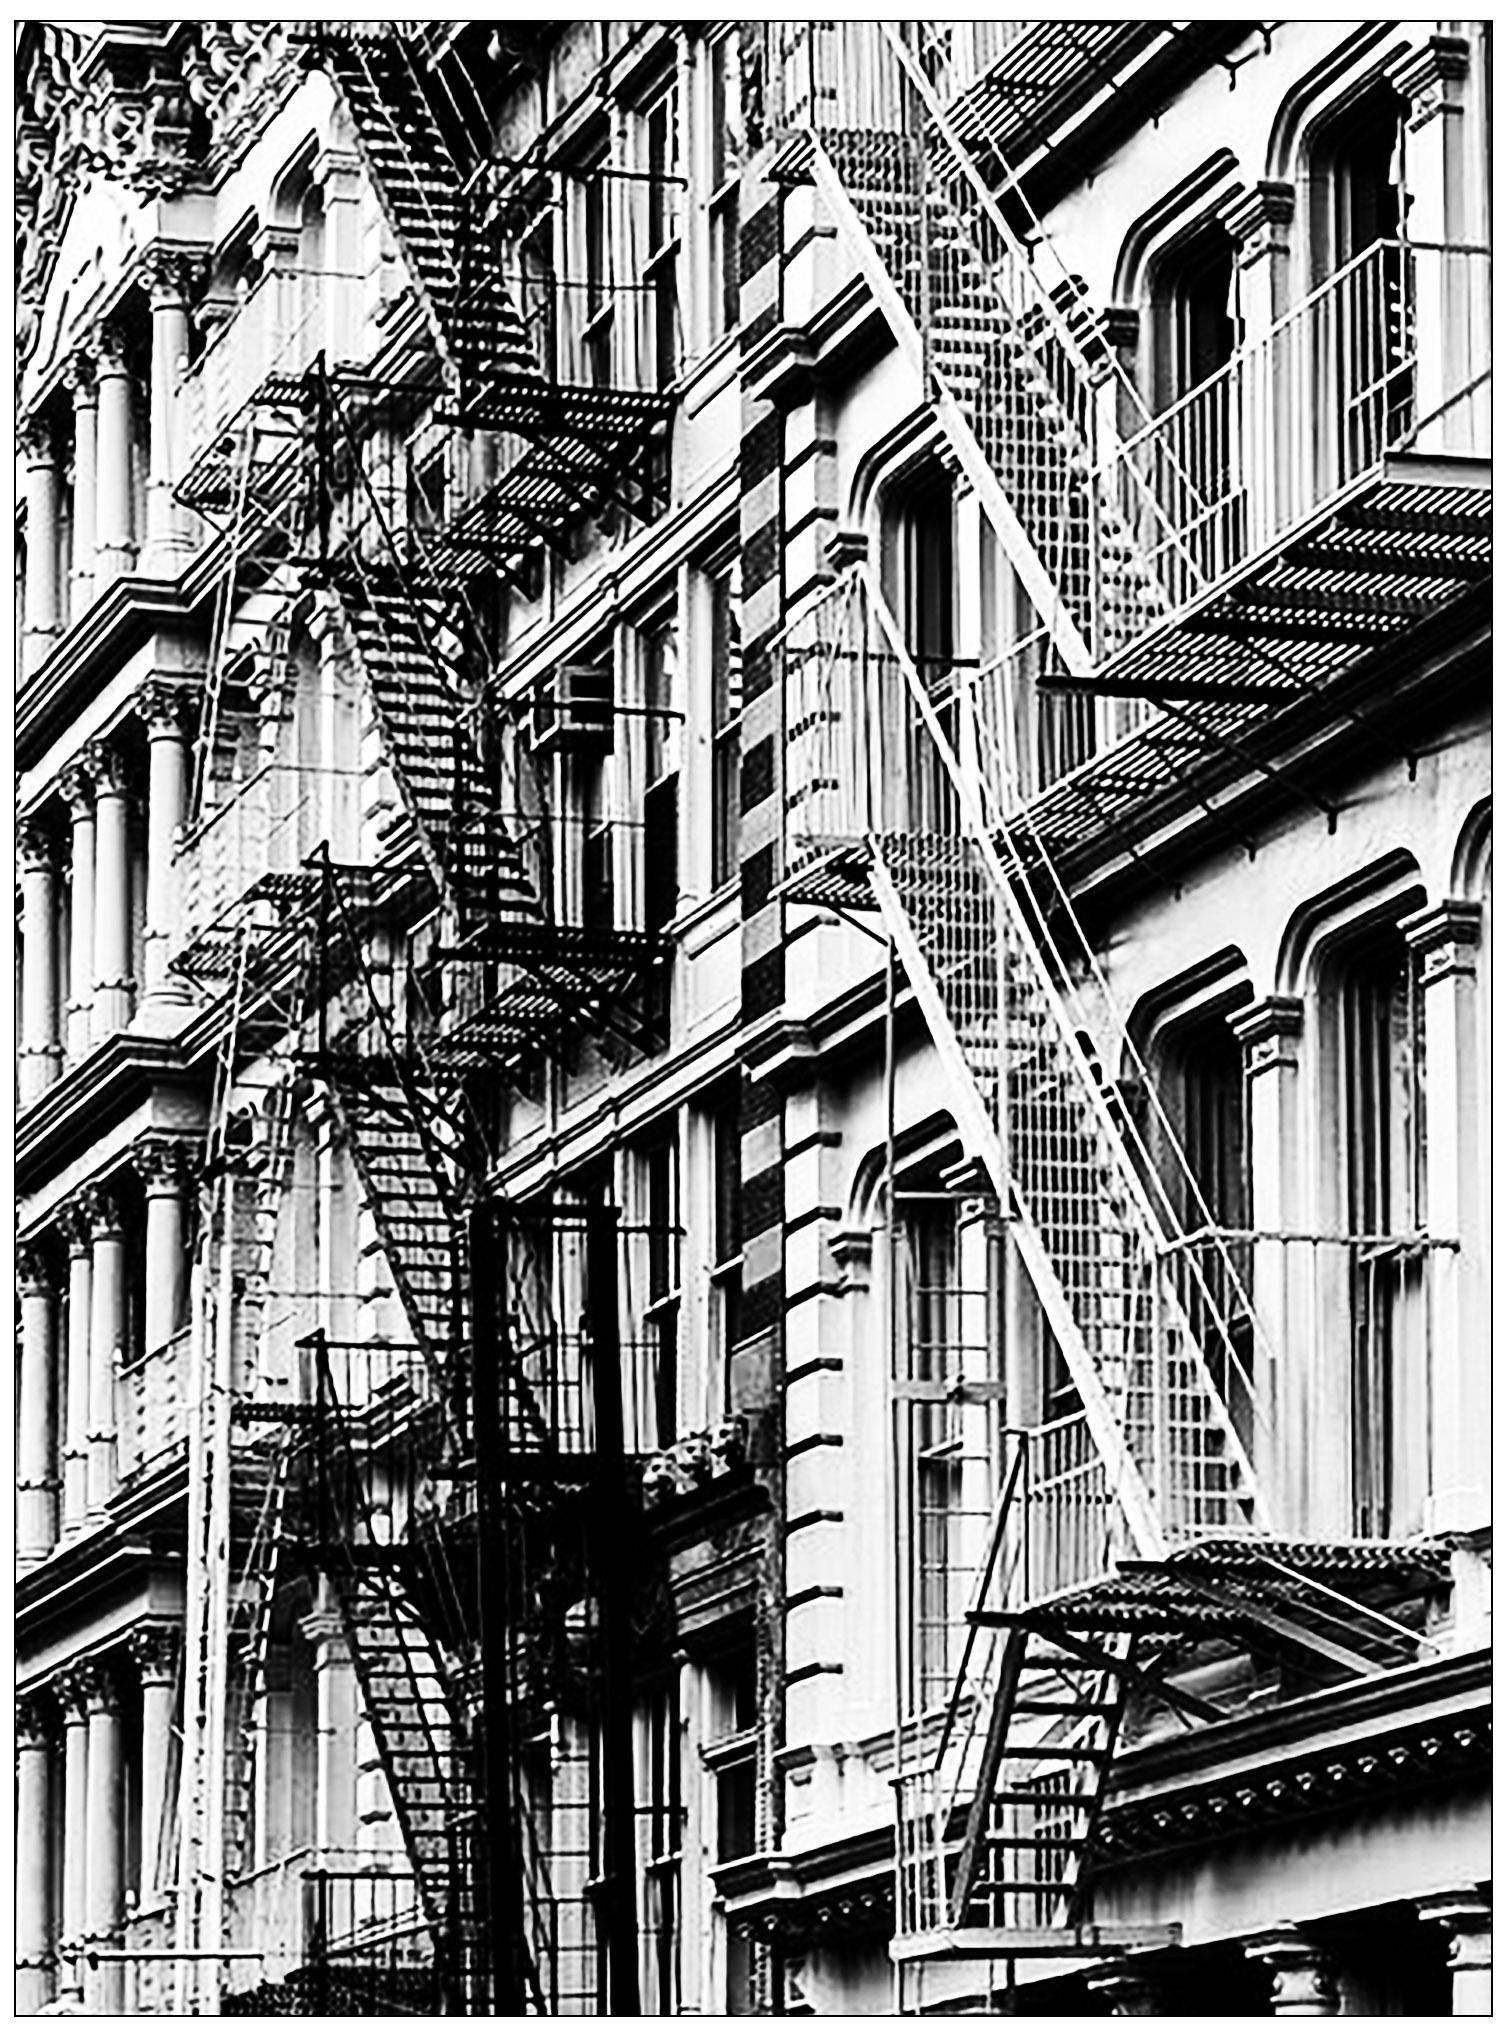 Les escaliers de New York